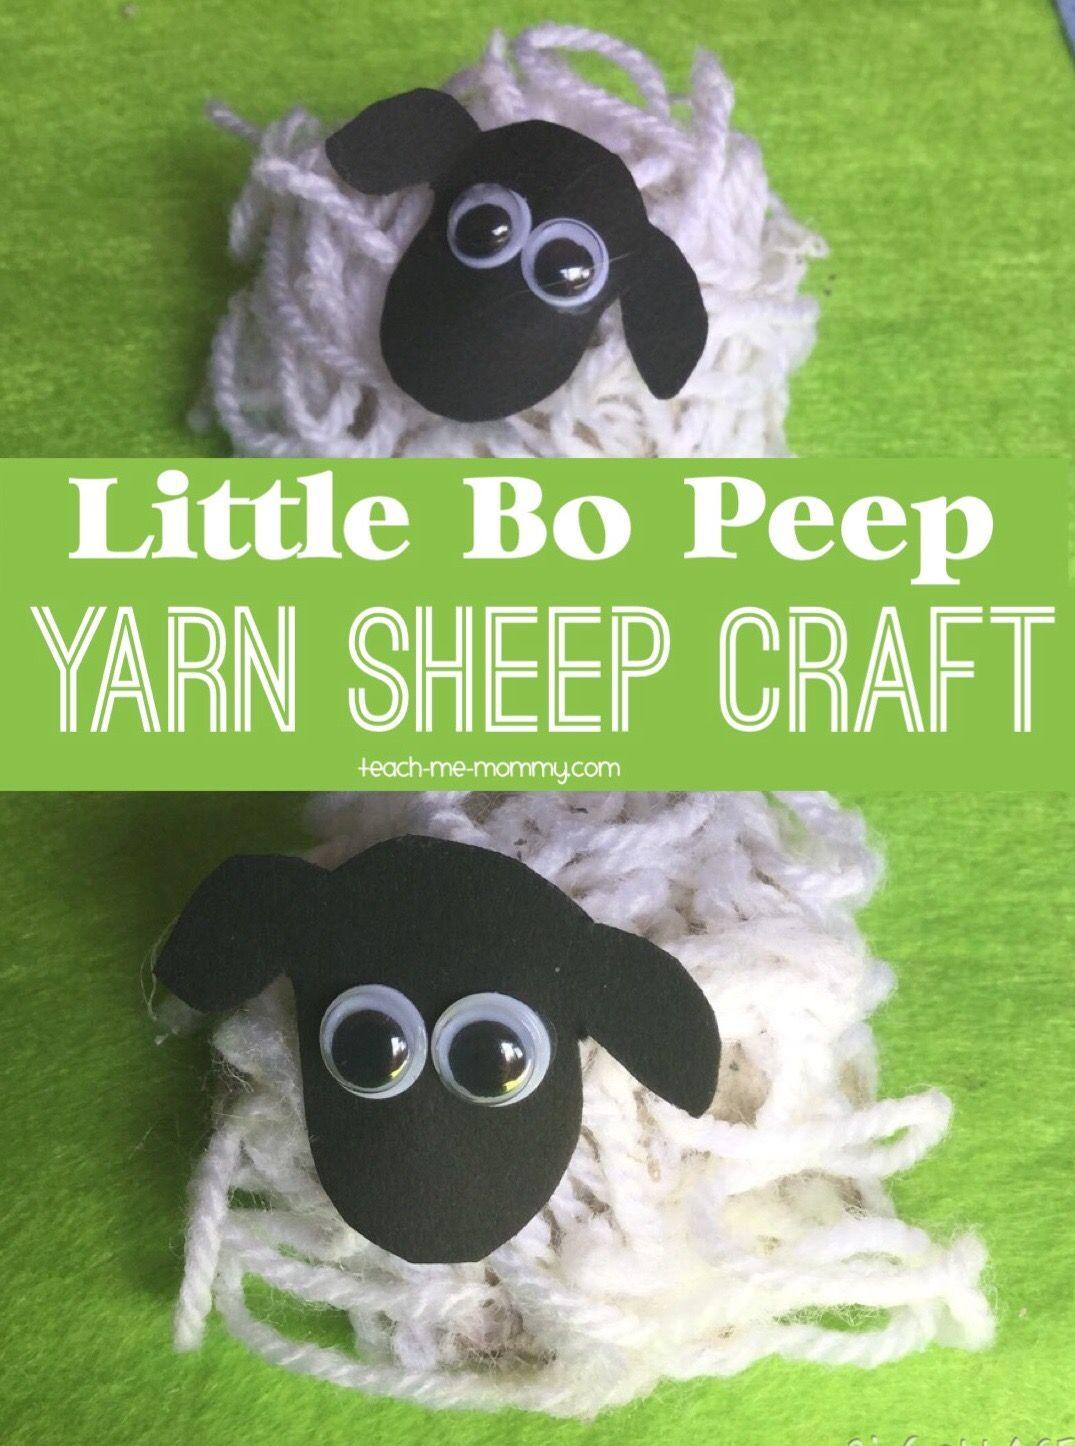 Little Bo Peep Sheep Craft   Sheep crafts, Yarns and Craft